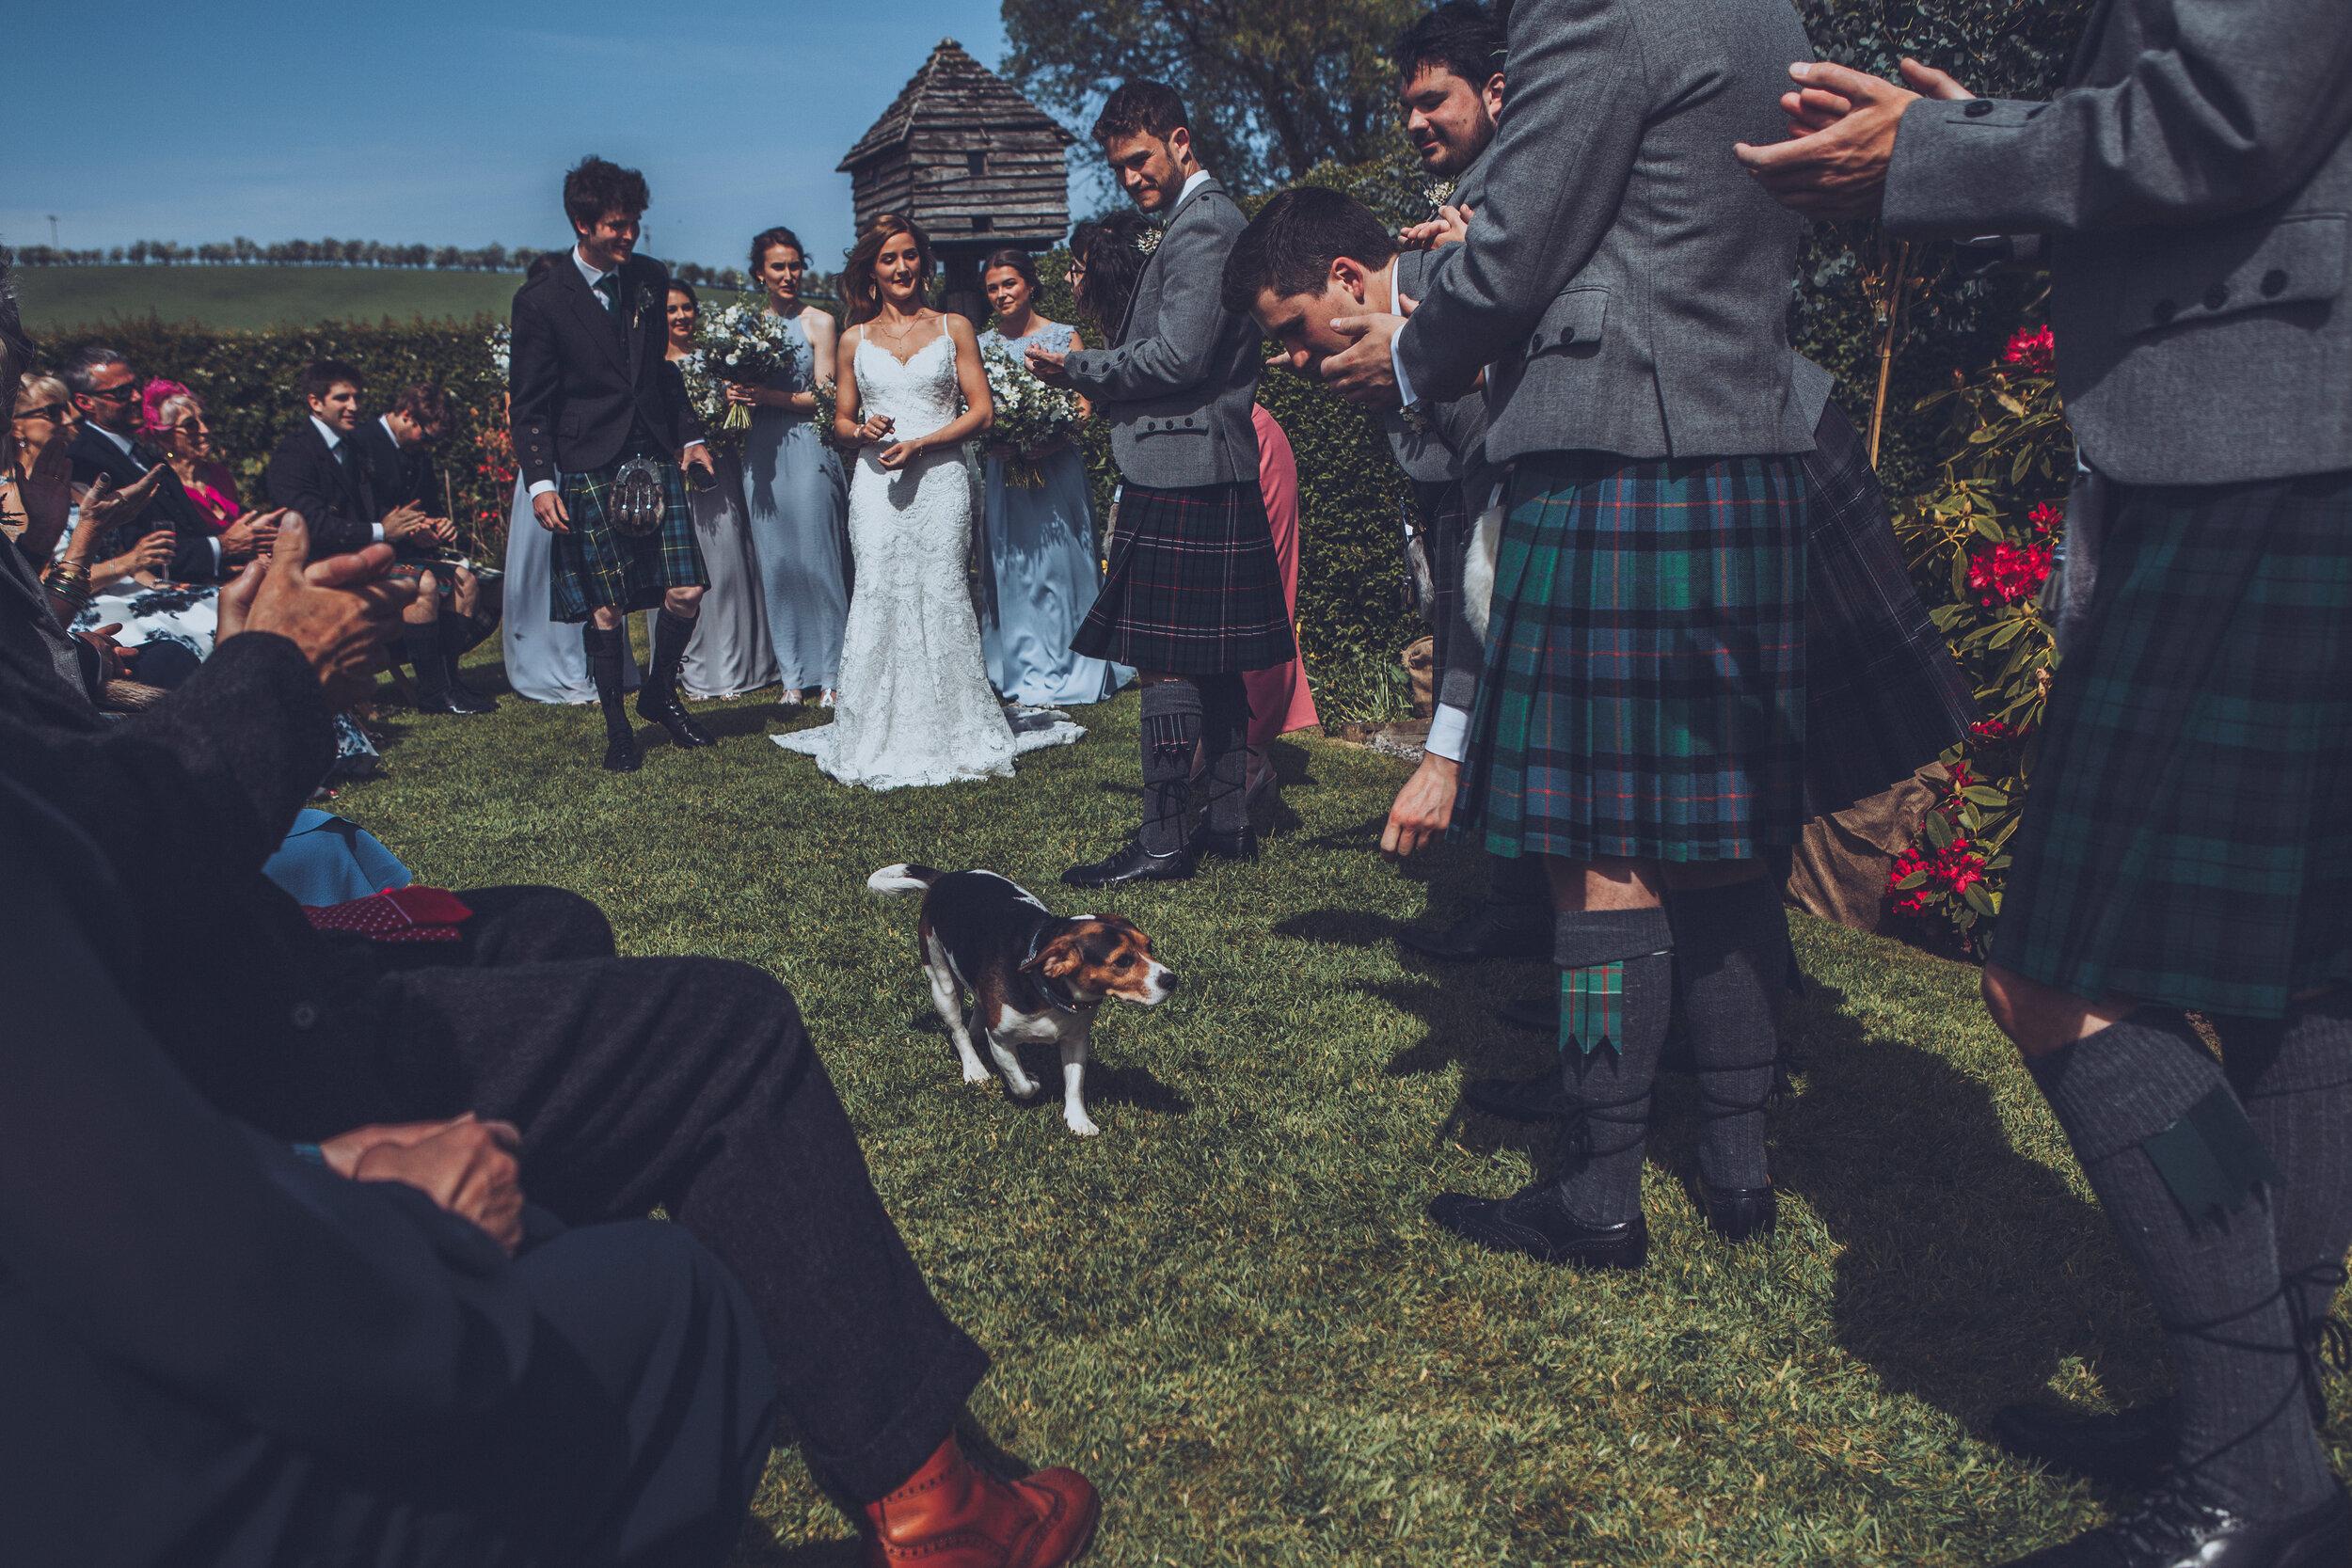 Dalduff Farm Ayrshire Wedding Photography - Claire Basiuk Photographer - 07.jpg